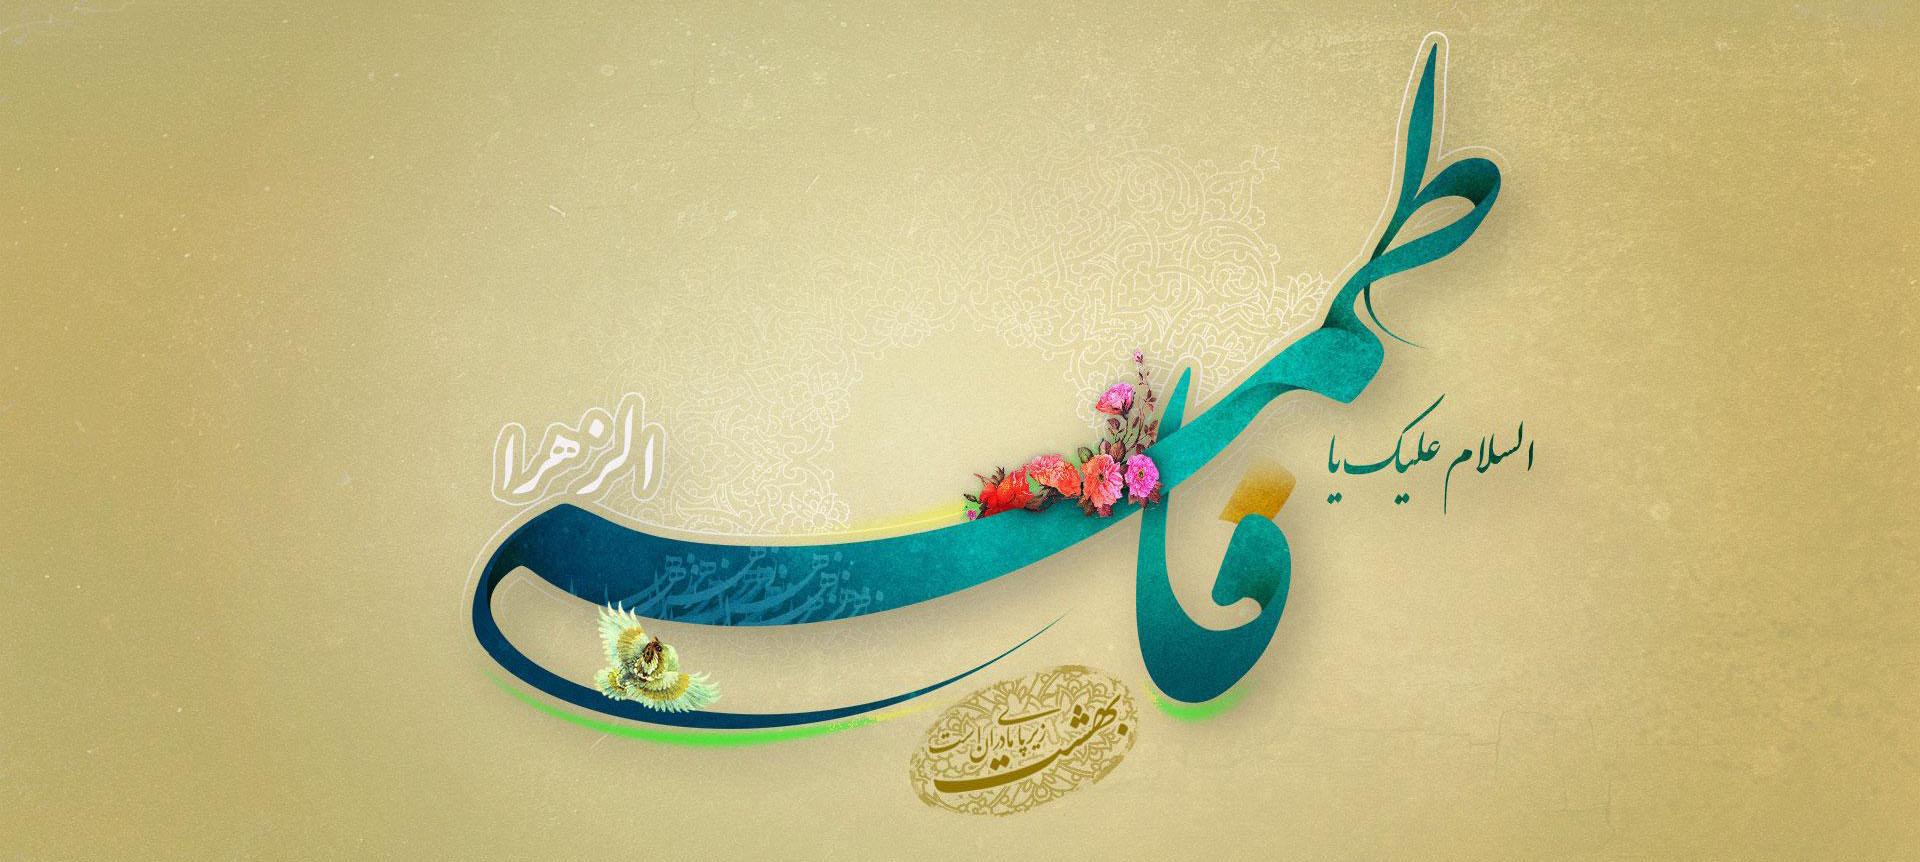 ولادت با سعادت حضرت زهرا سلام الله عليها مبارك باد